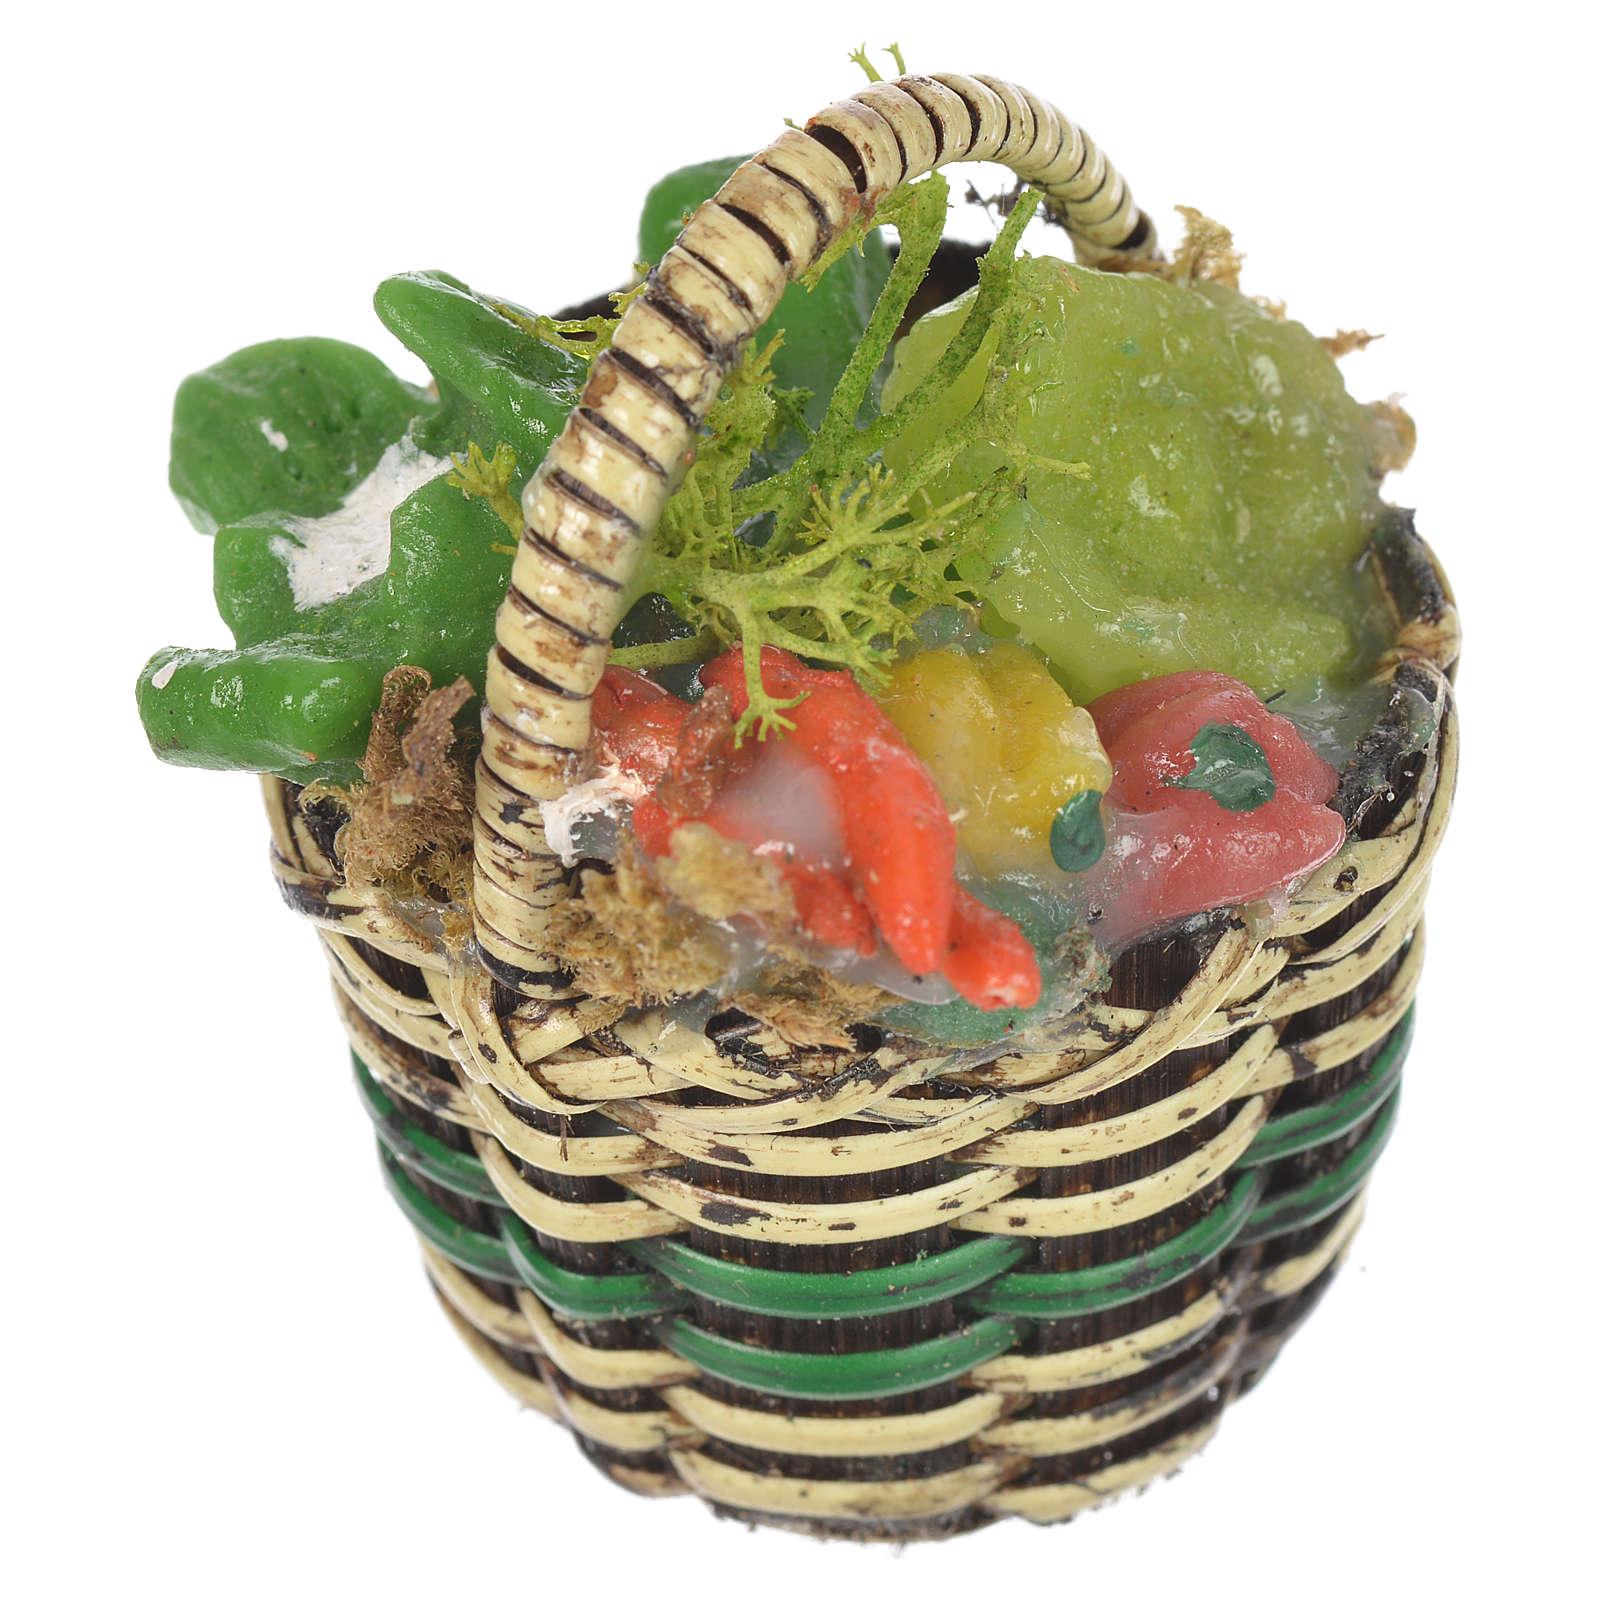 Cestino con verdure cera presepe per figure 20-24 cm 4